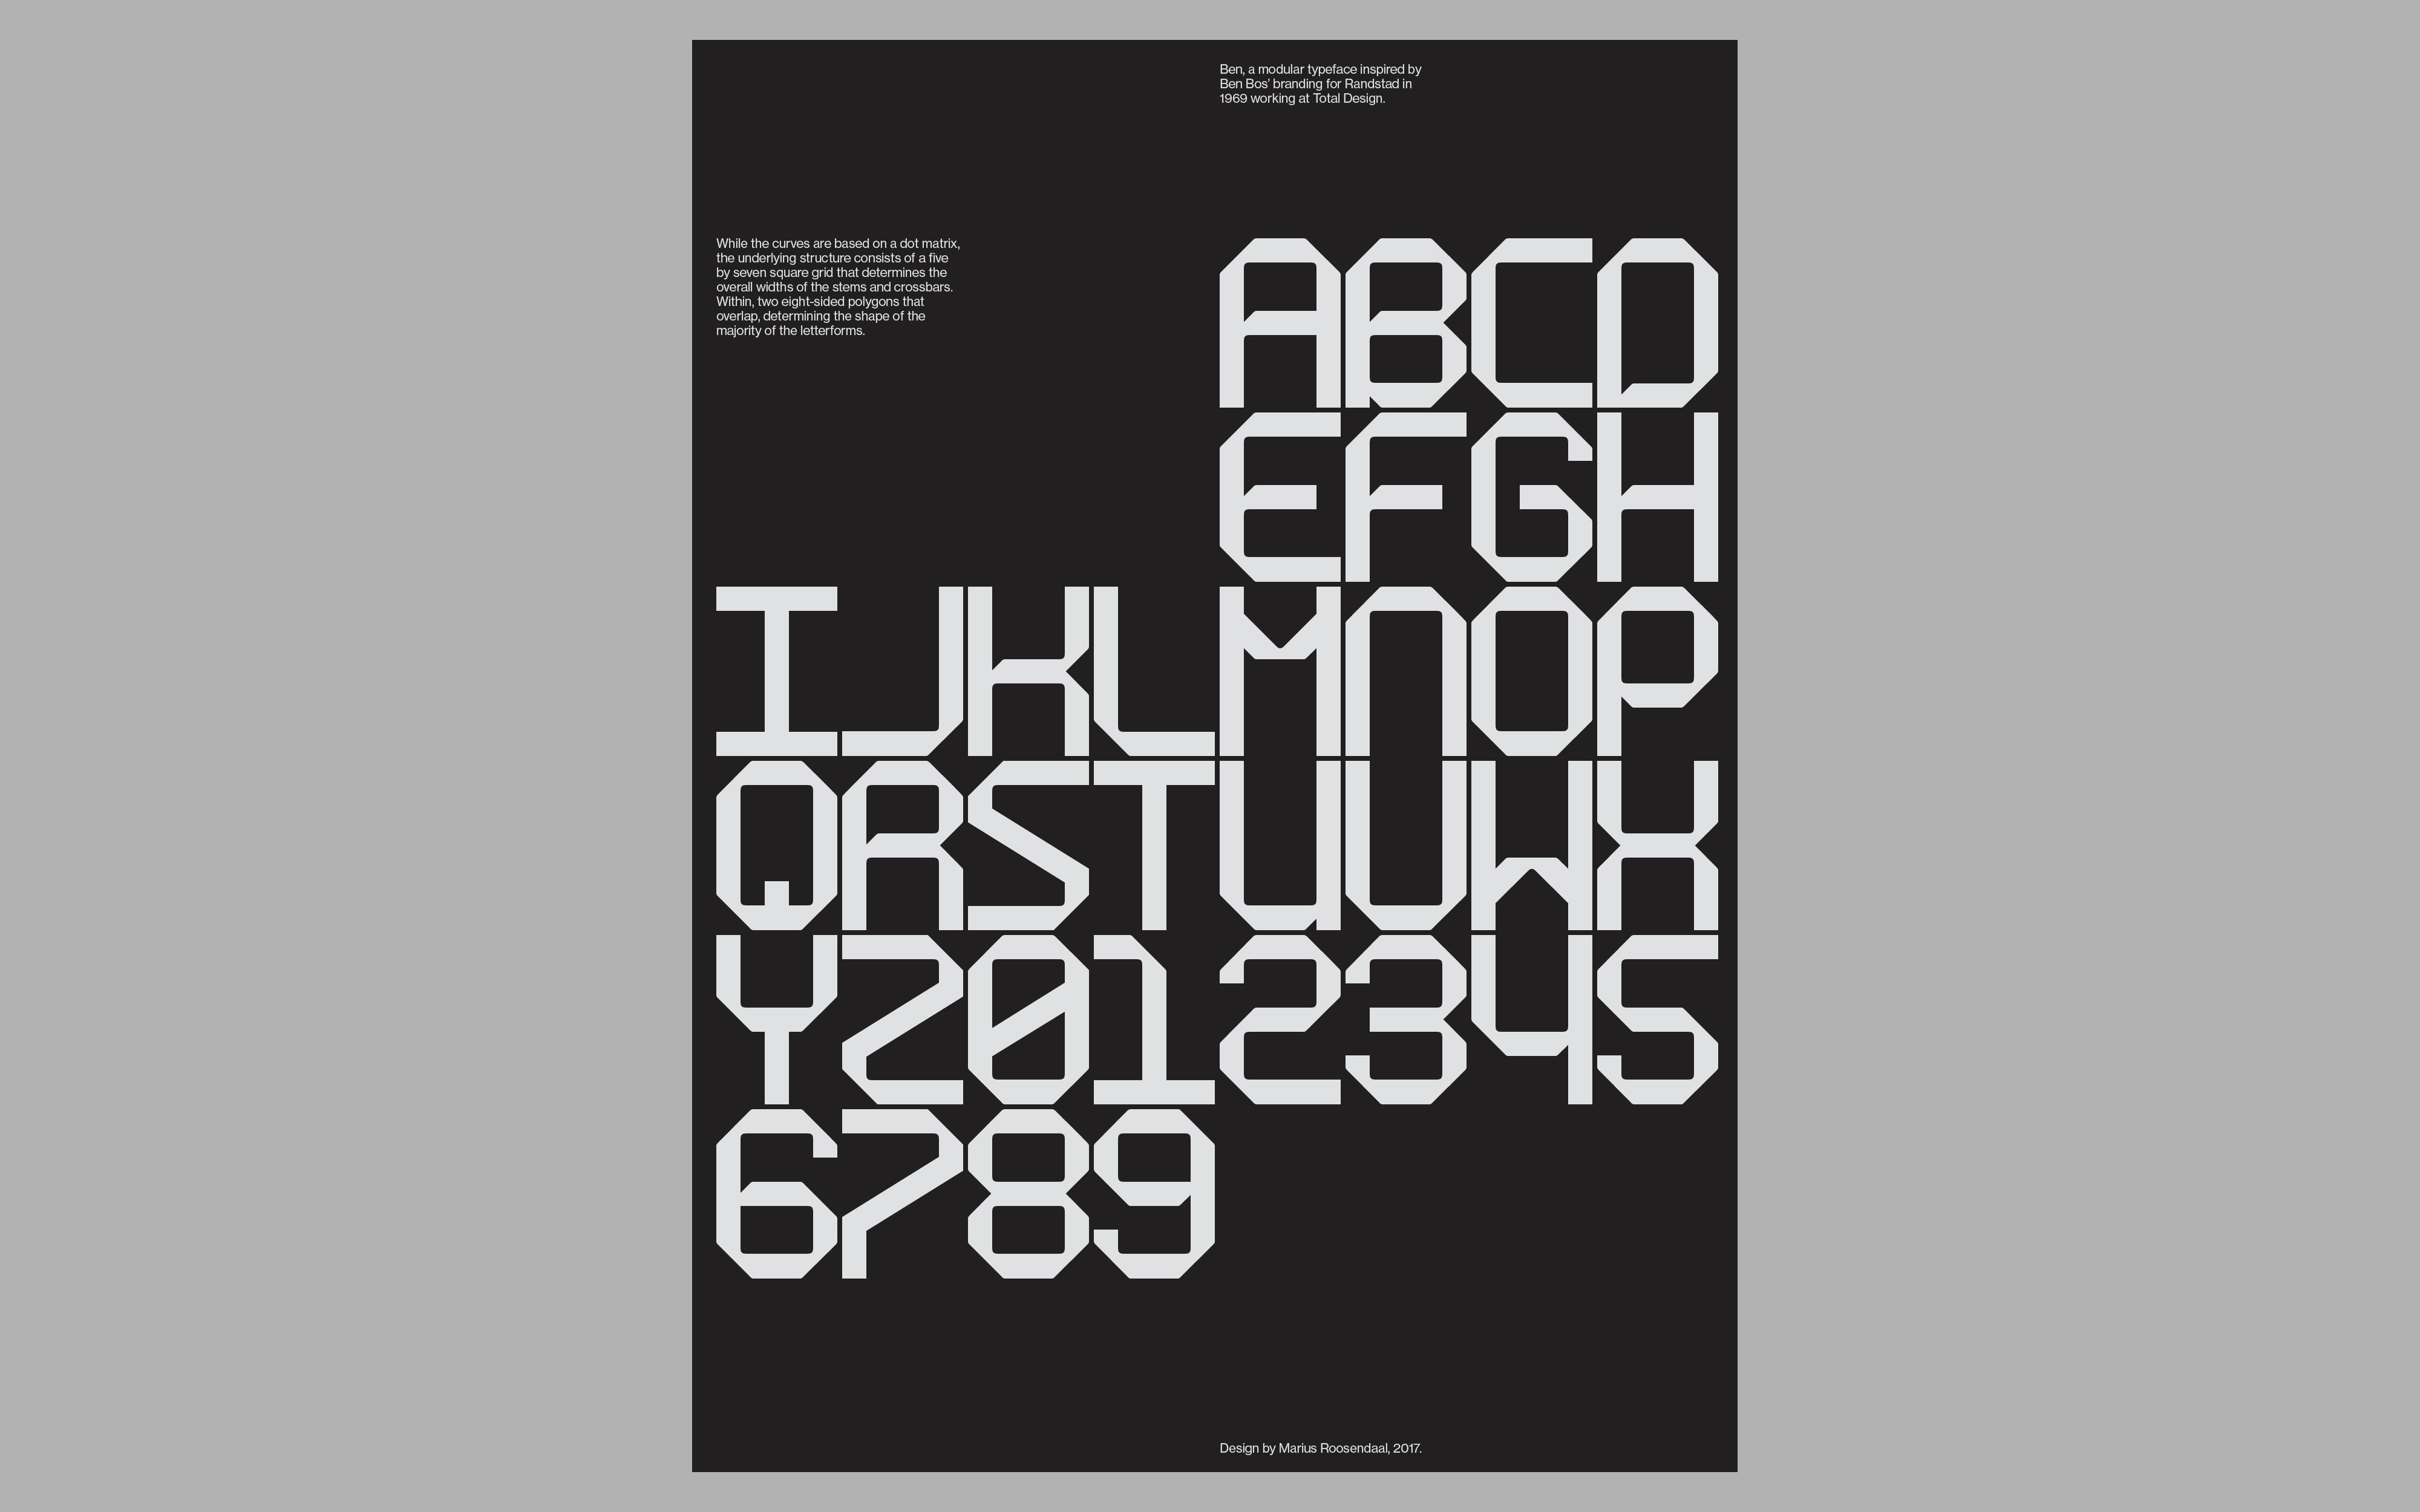 Marius Roosendaal —Bos Poster